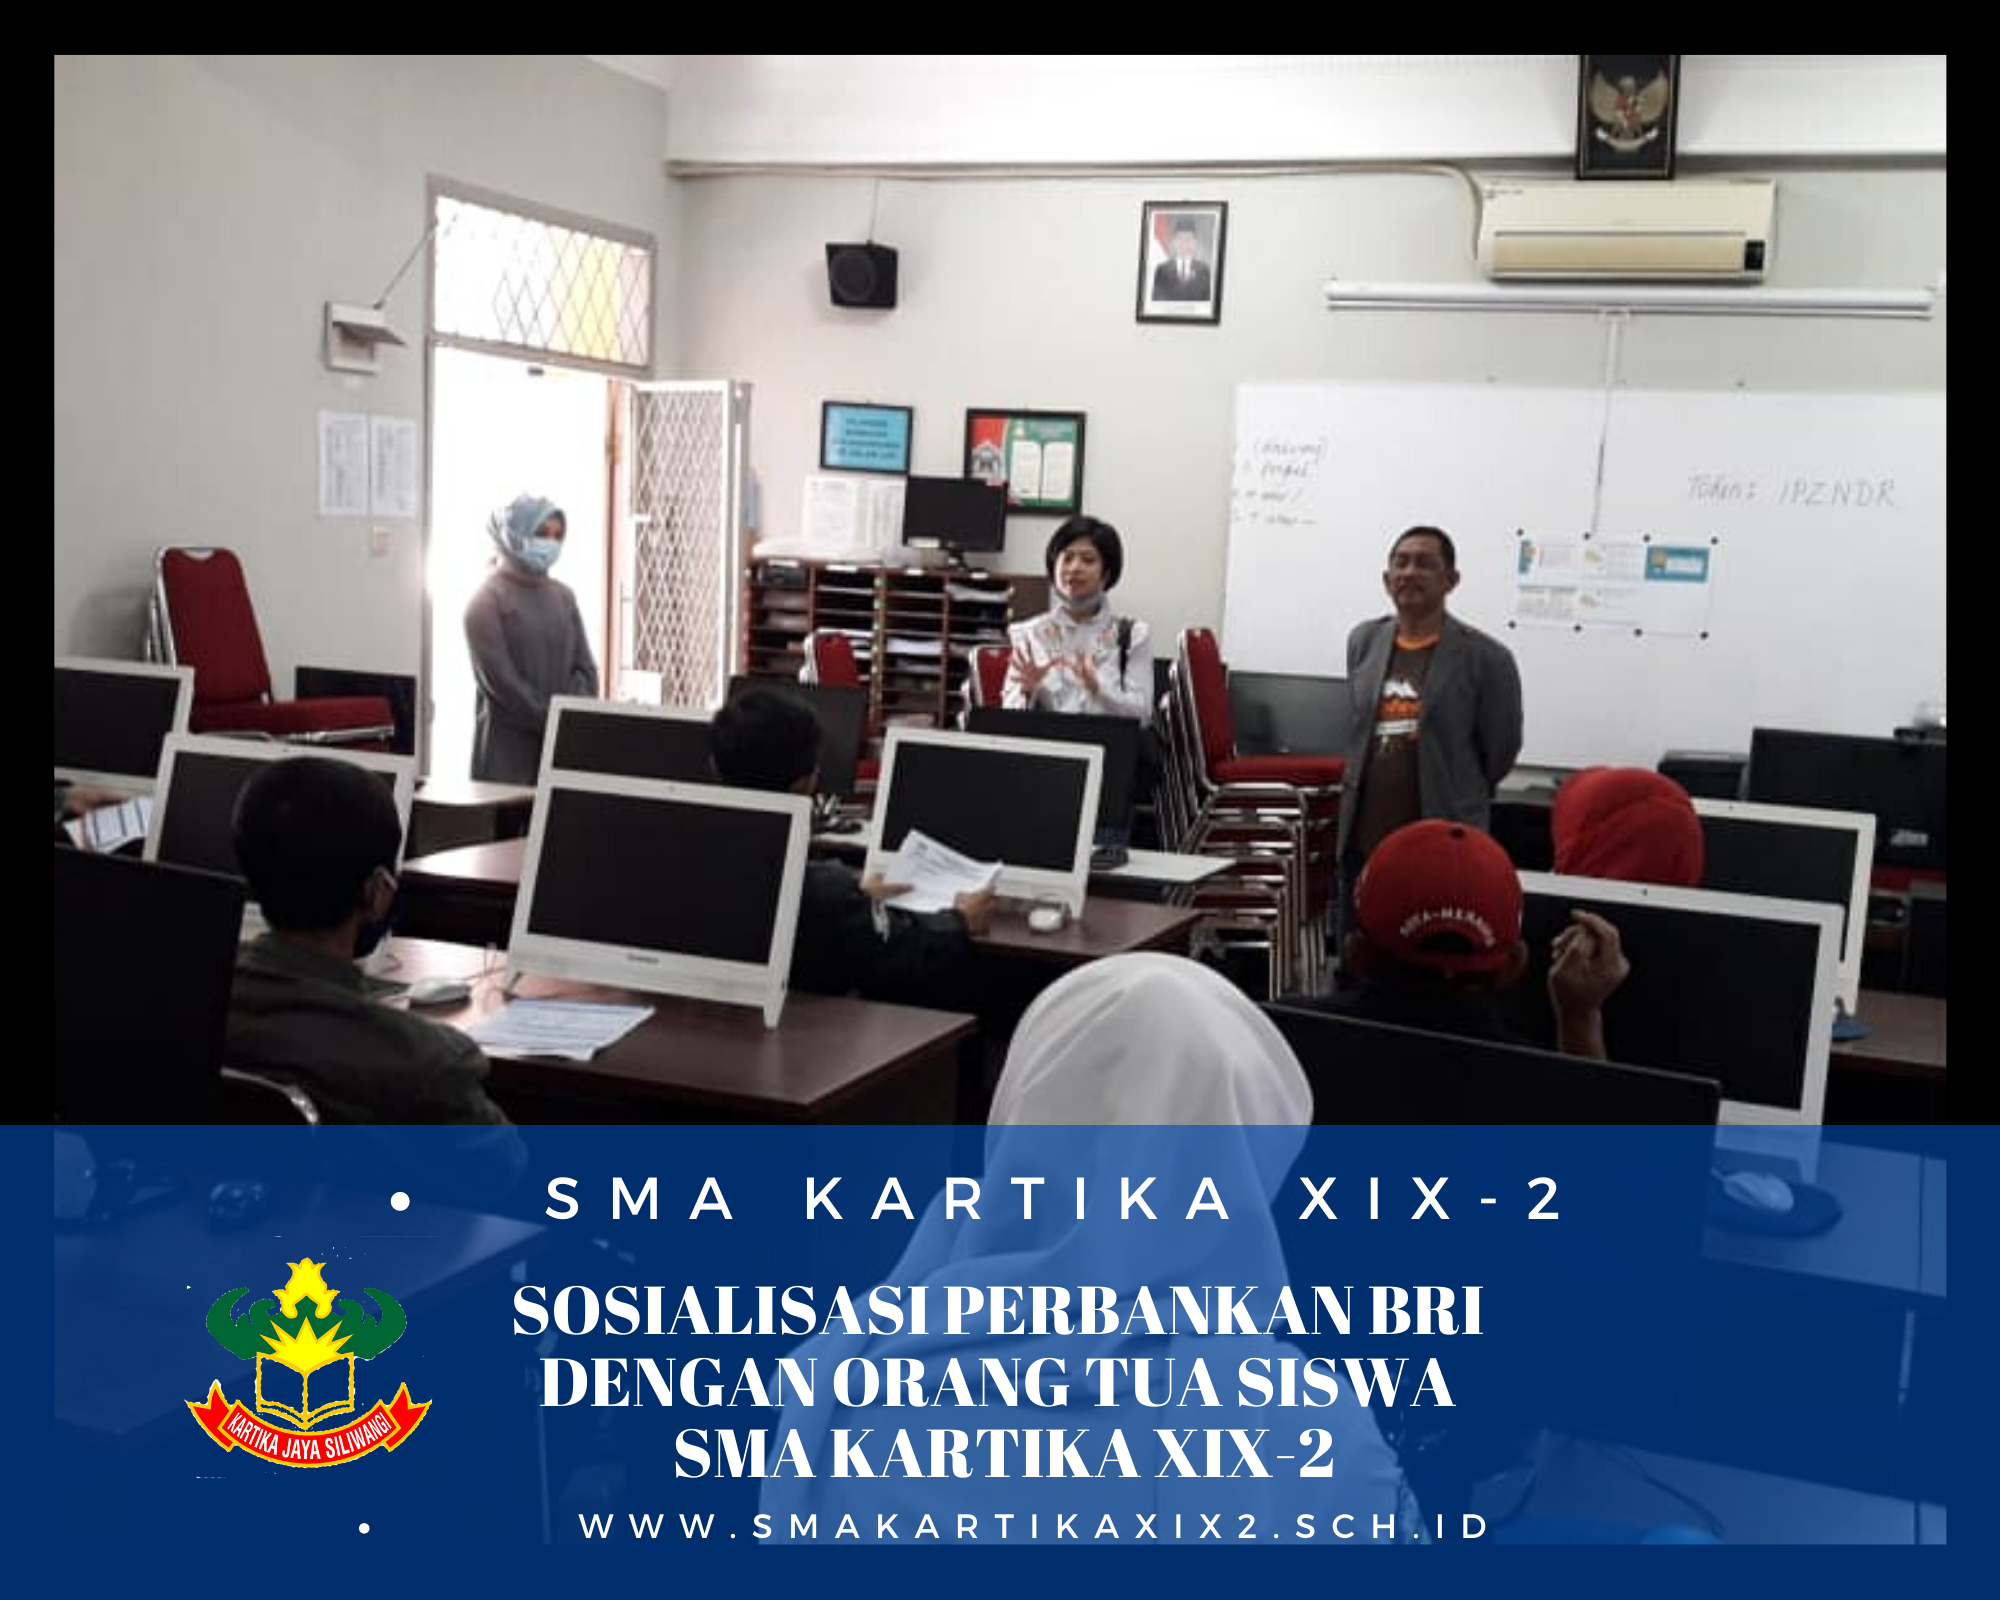 SOSIALISASI PERBANKAN BRI DI SMA KARTIKA XIX-2